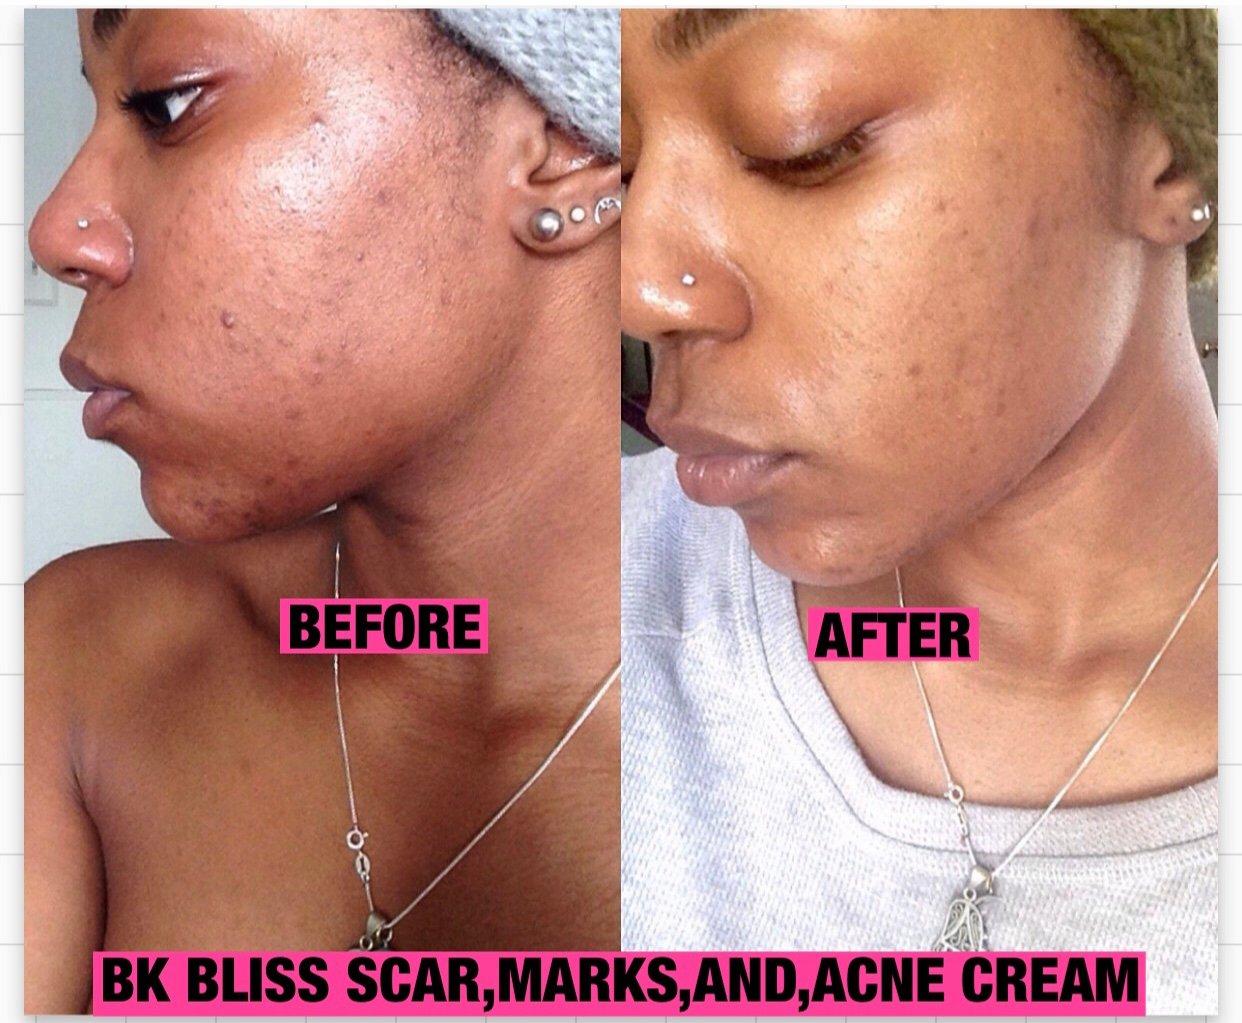 Image of B.K Bliss bleaching cream